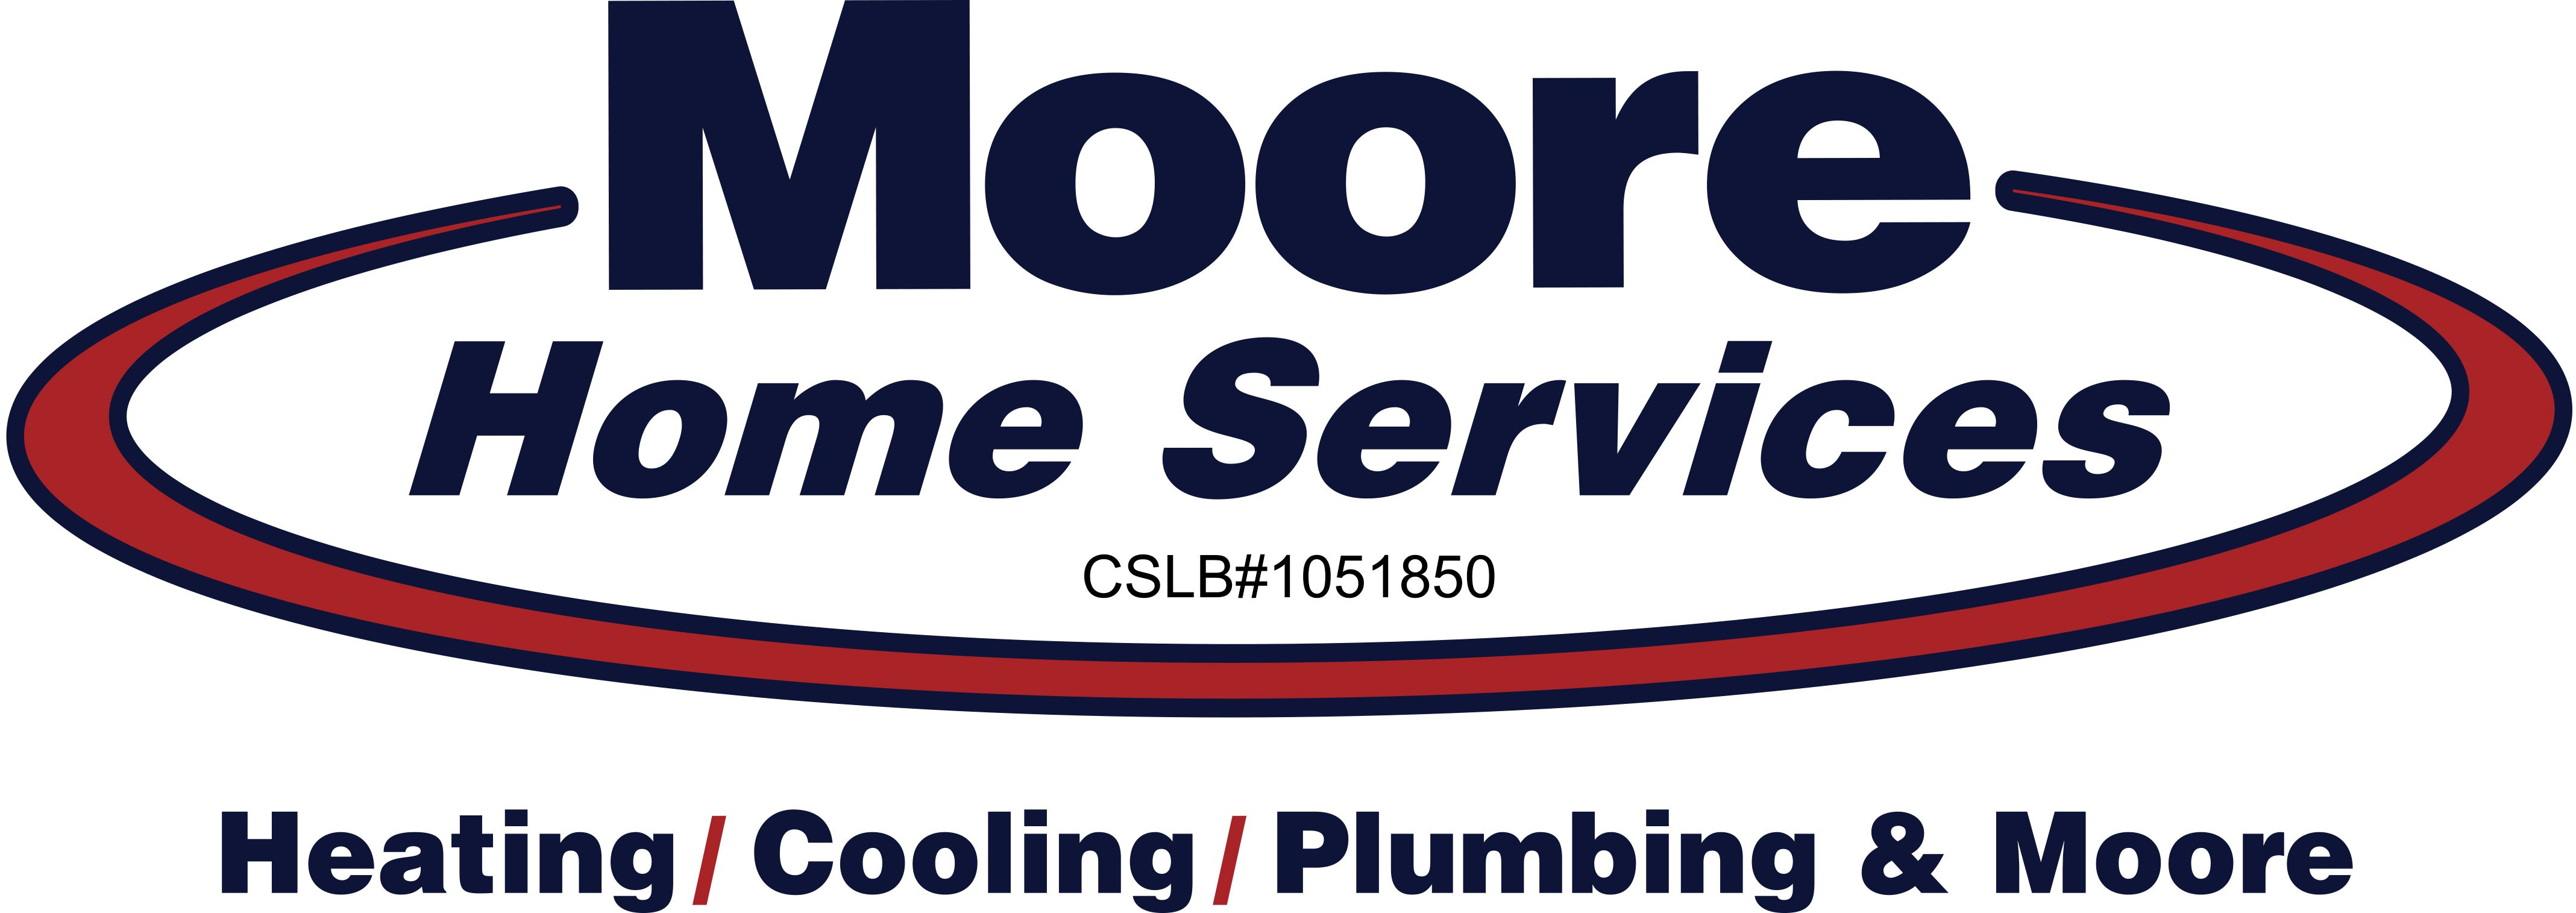 Ac Maintenance Services Ac Maintenance Air Conditioning